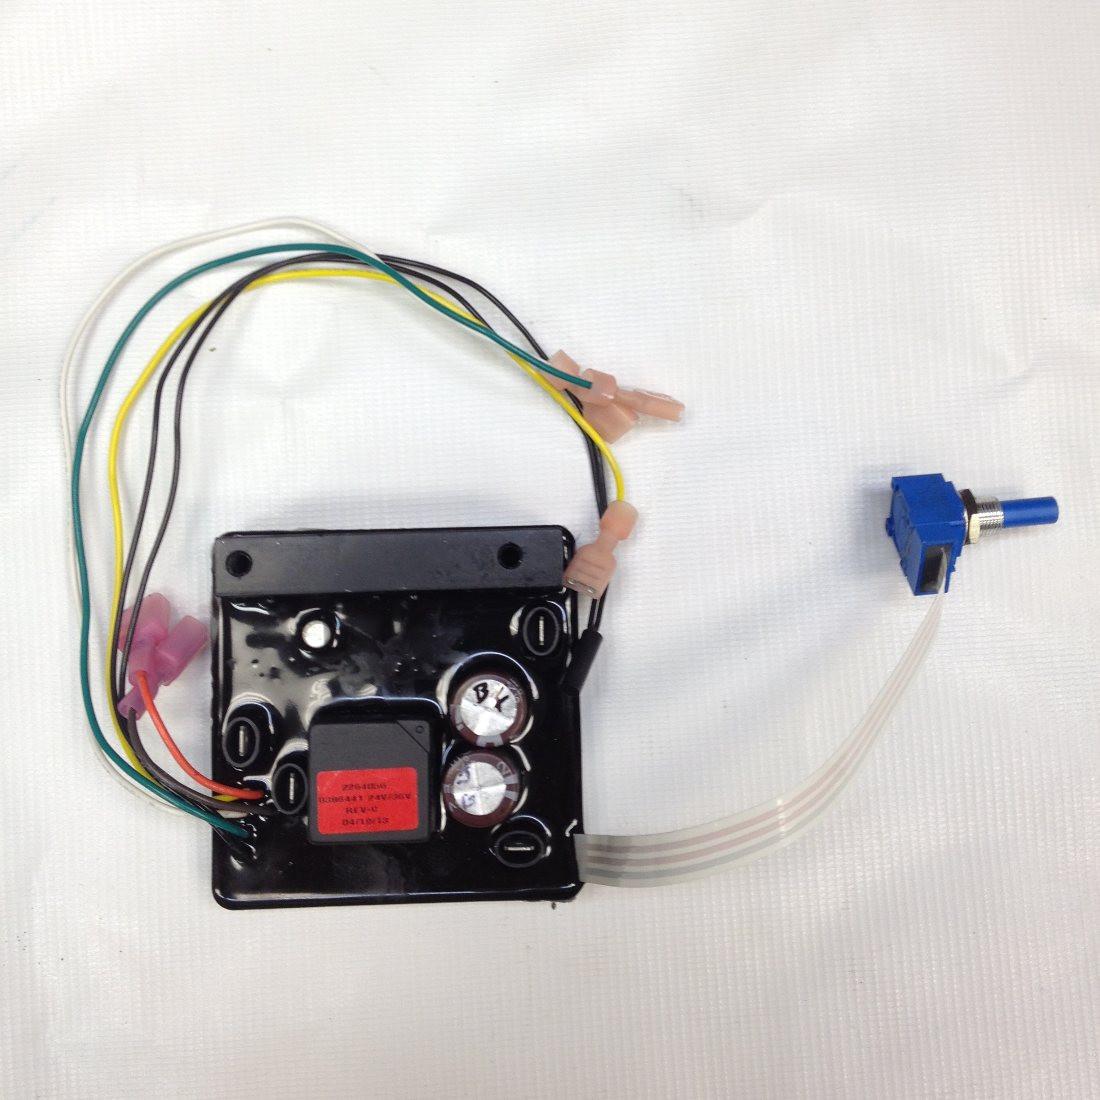 hight resolution of minn kota maxxum 12 volt control board upgrade price 179 95 image 1 larger more photos